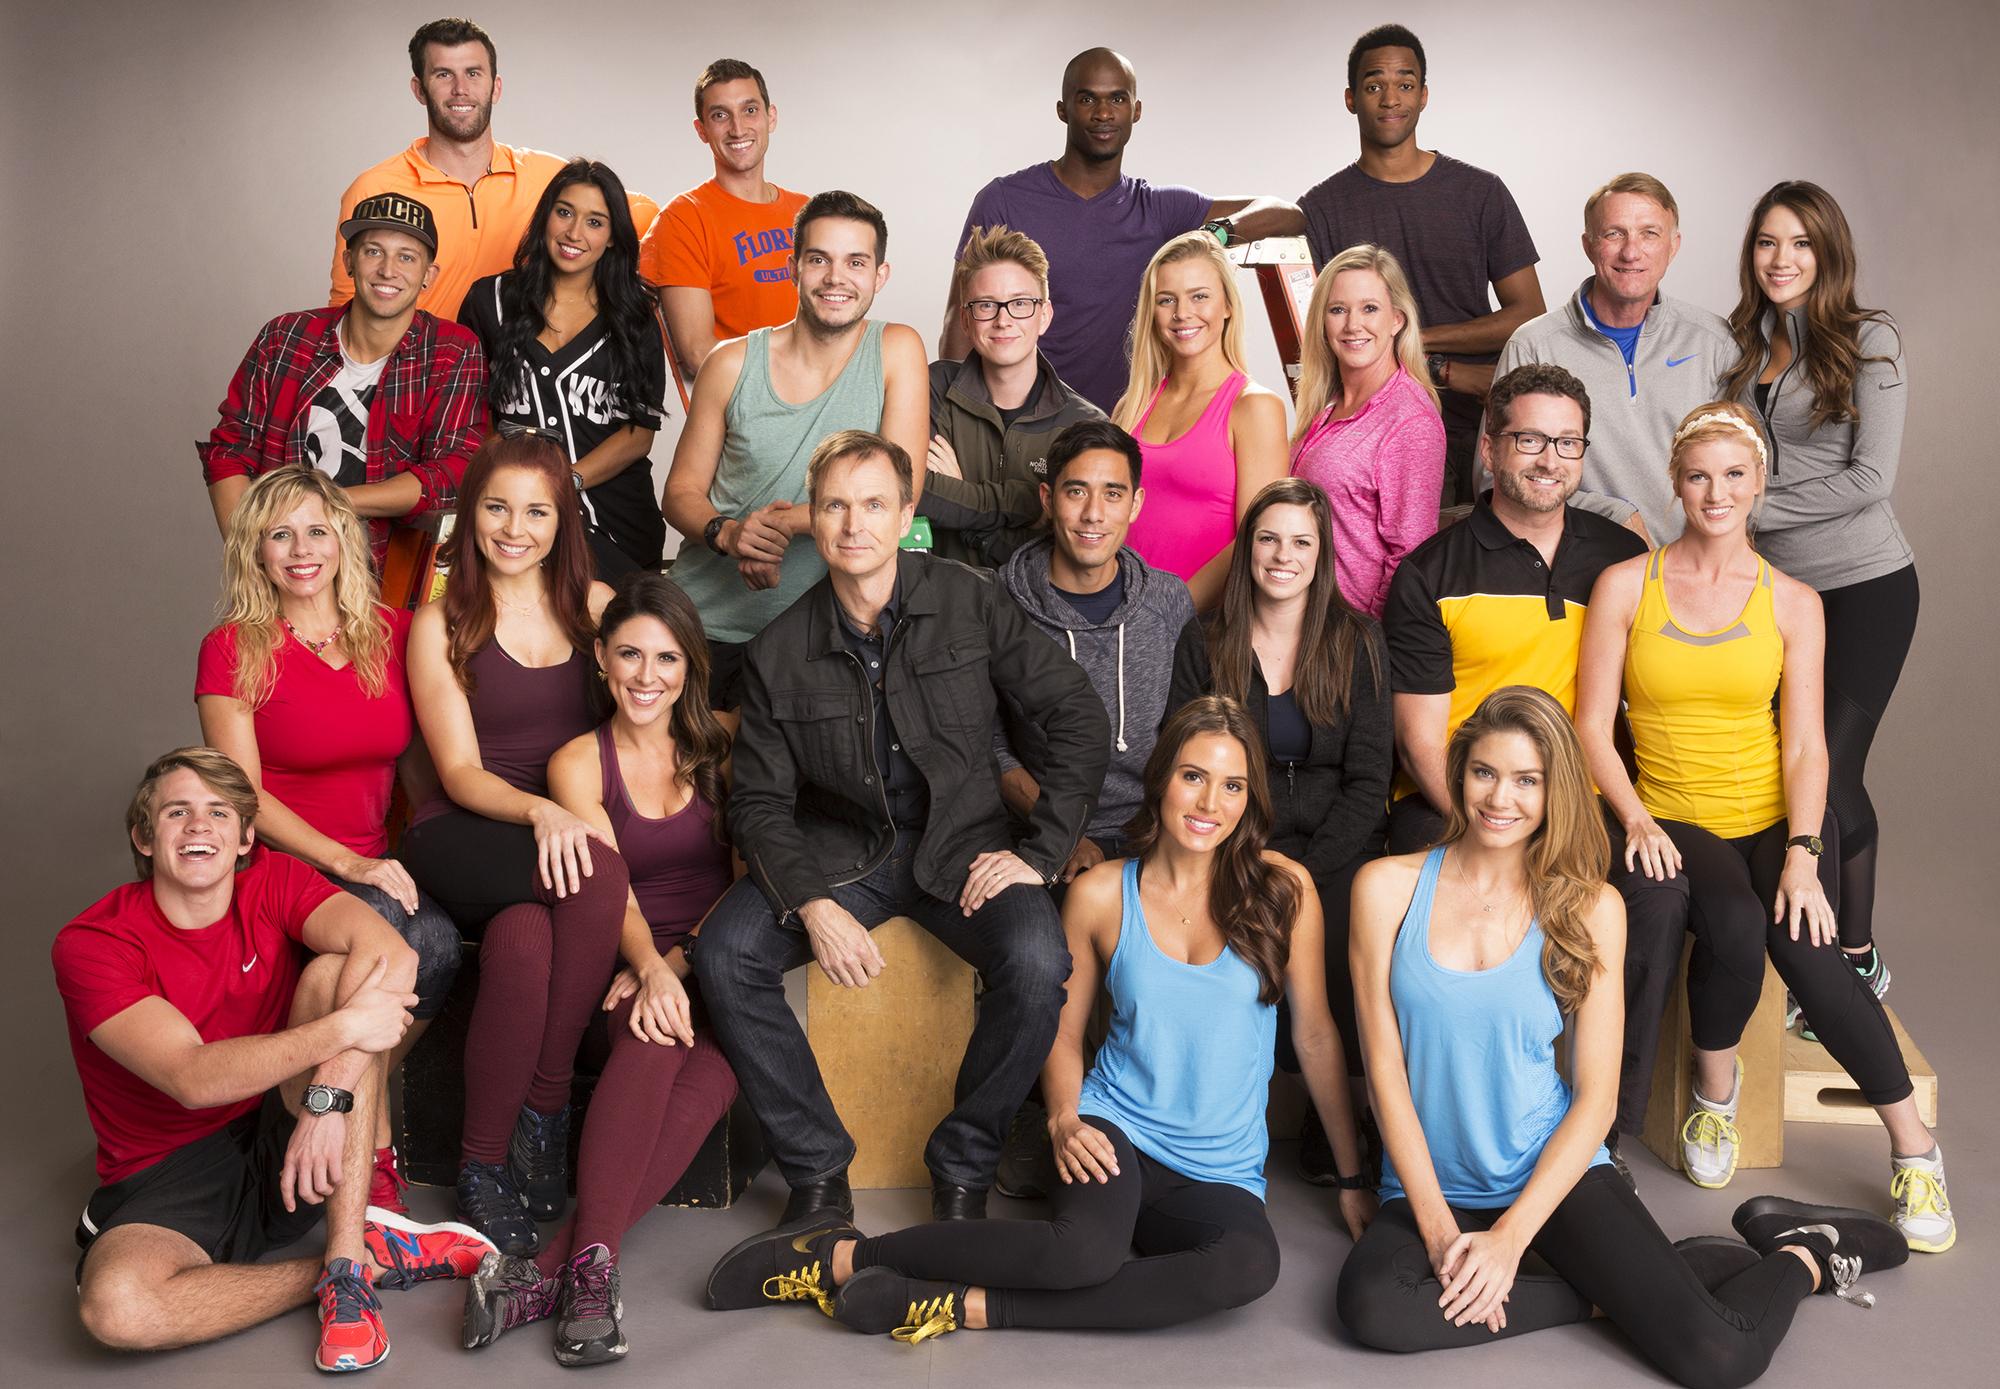 The Amazing Race 28 Cast